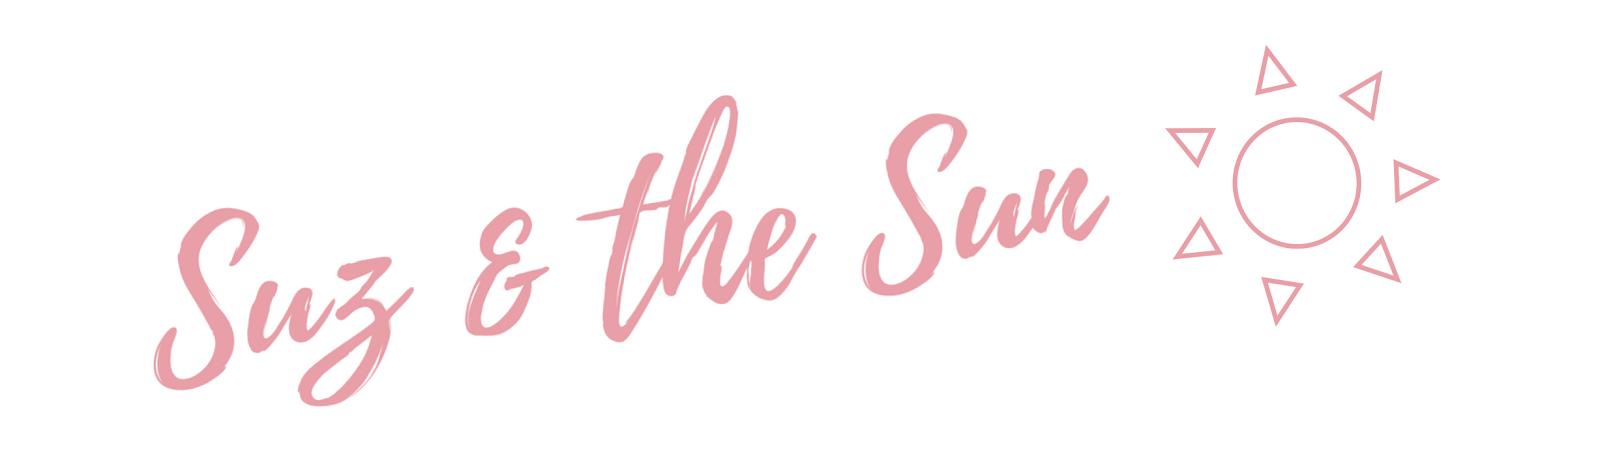 Suz & the Sun